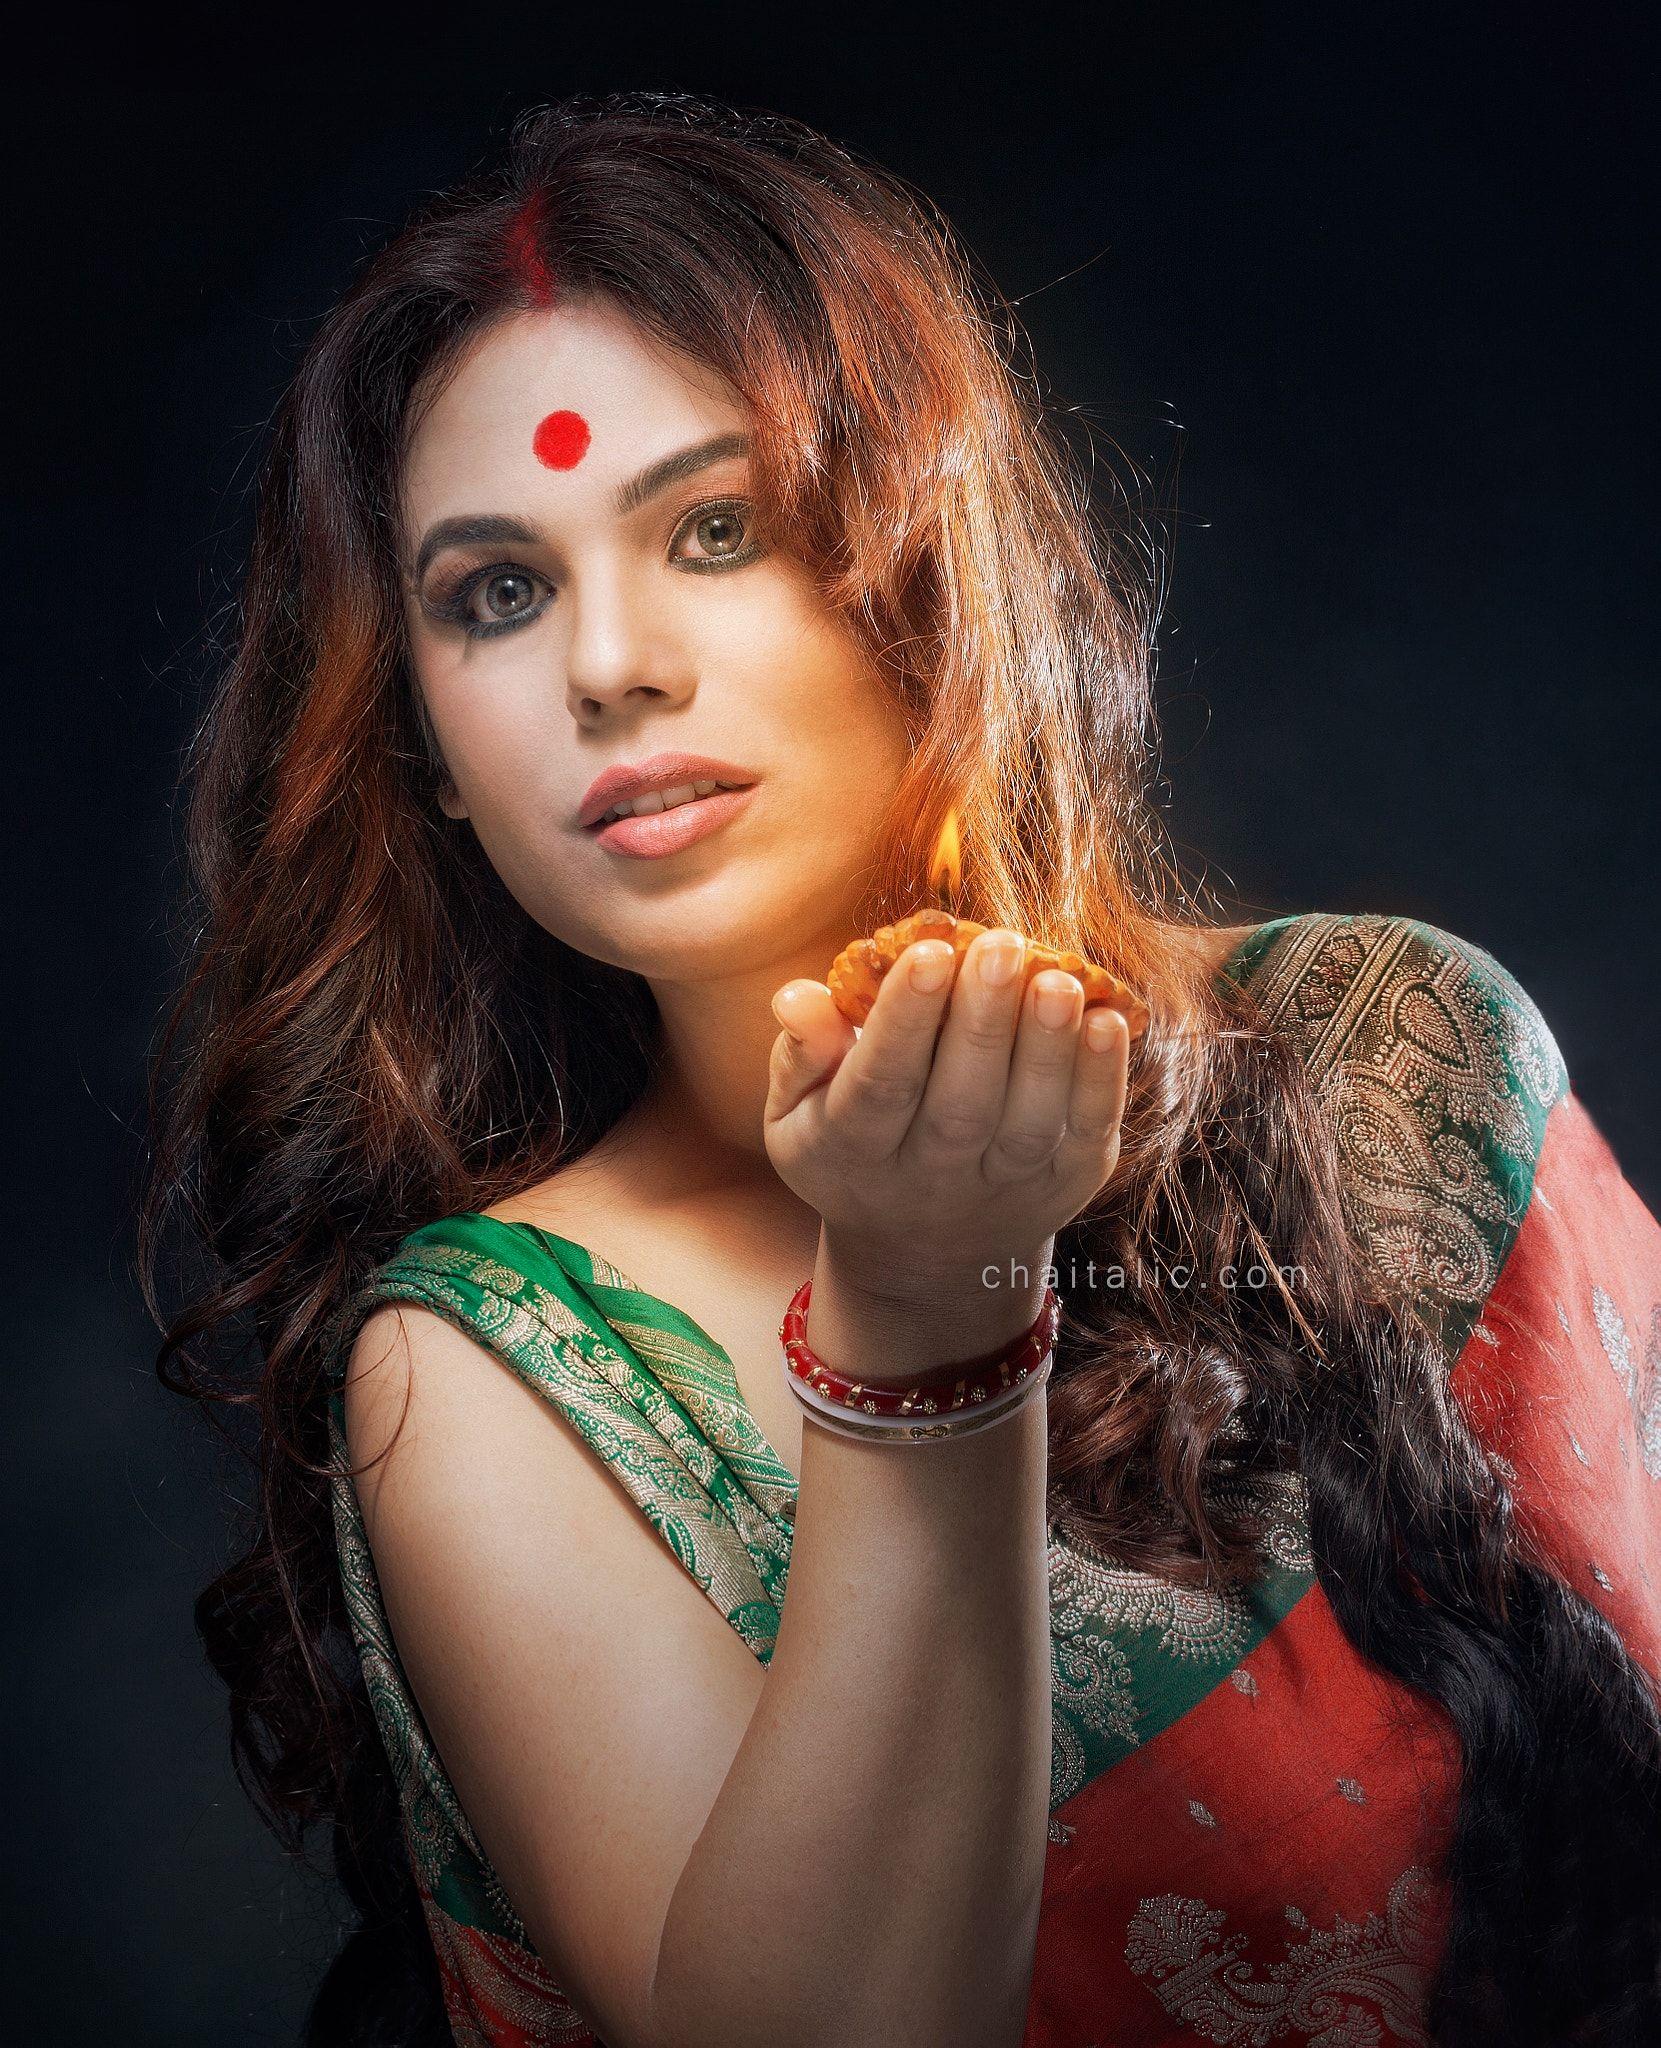 Transgender Model - Shree Ghatak as a transgender who got married